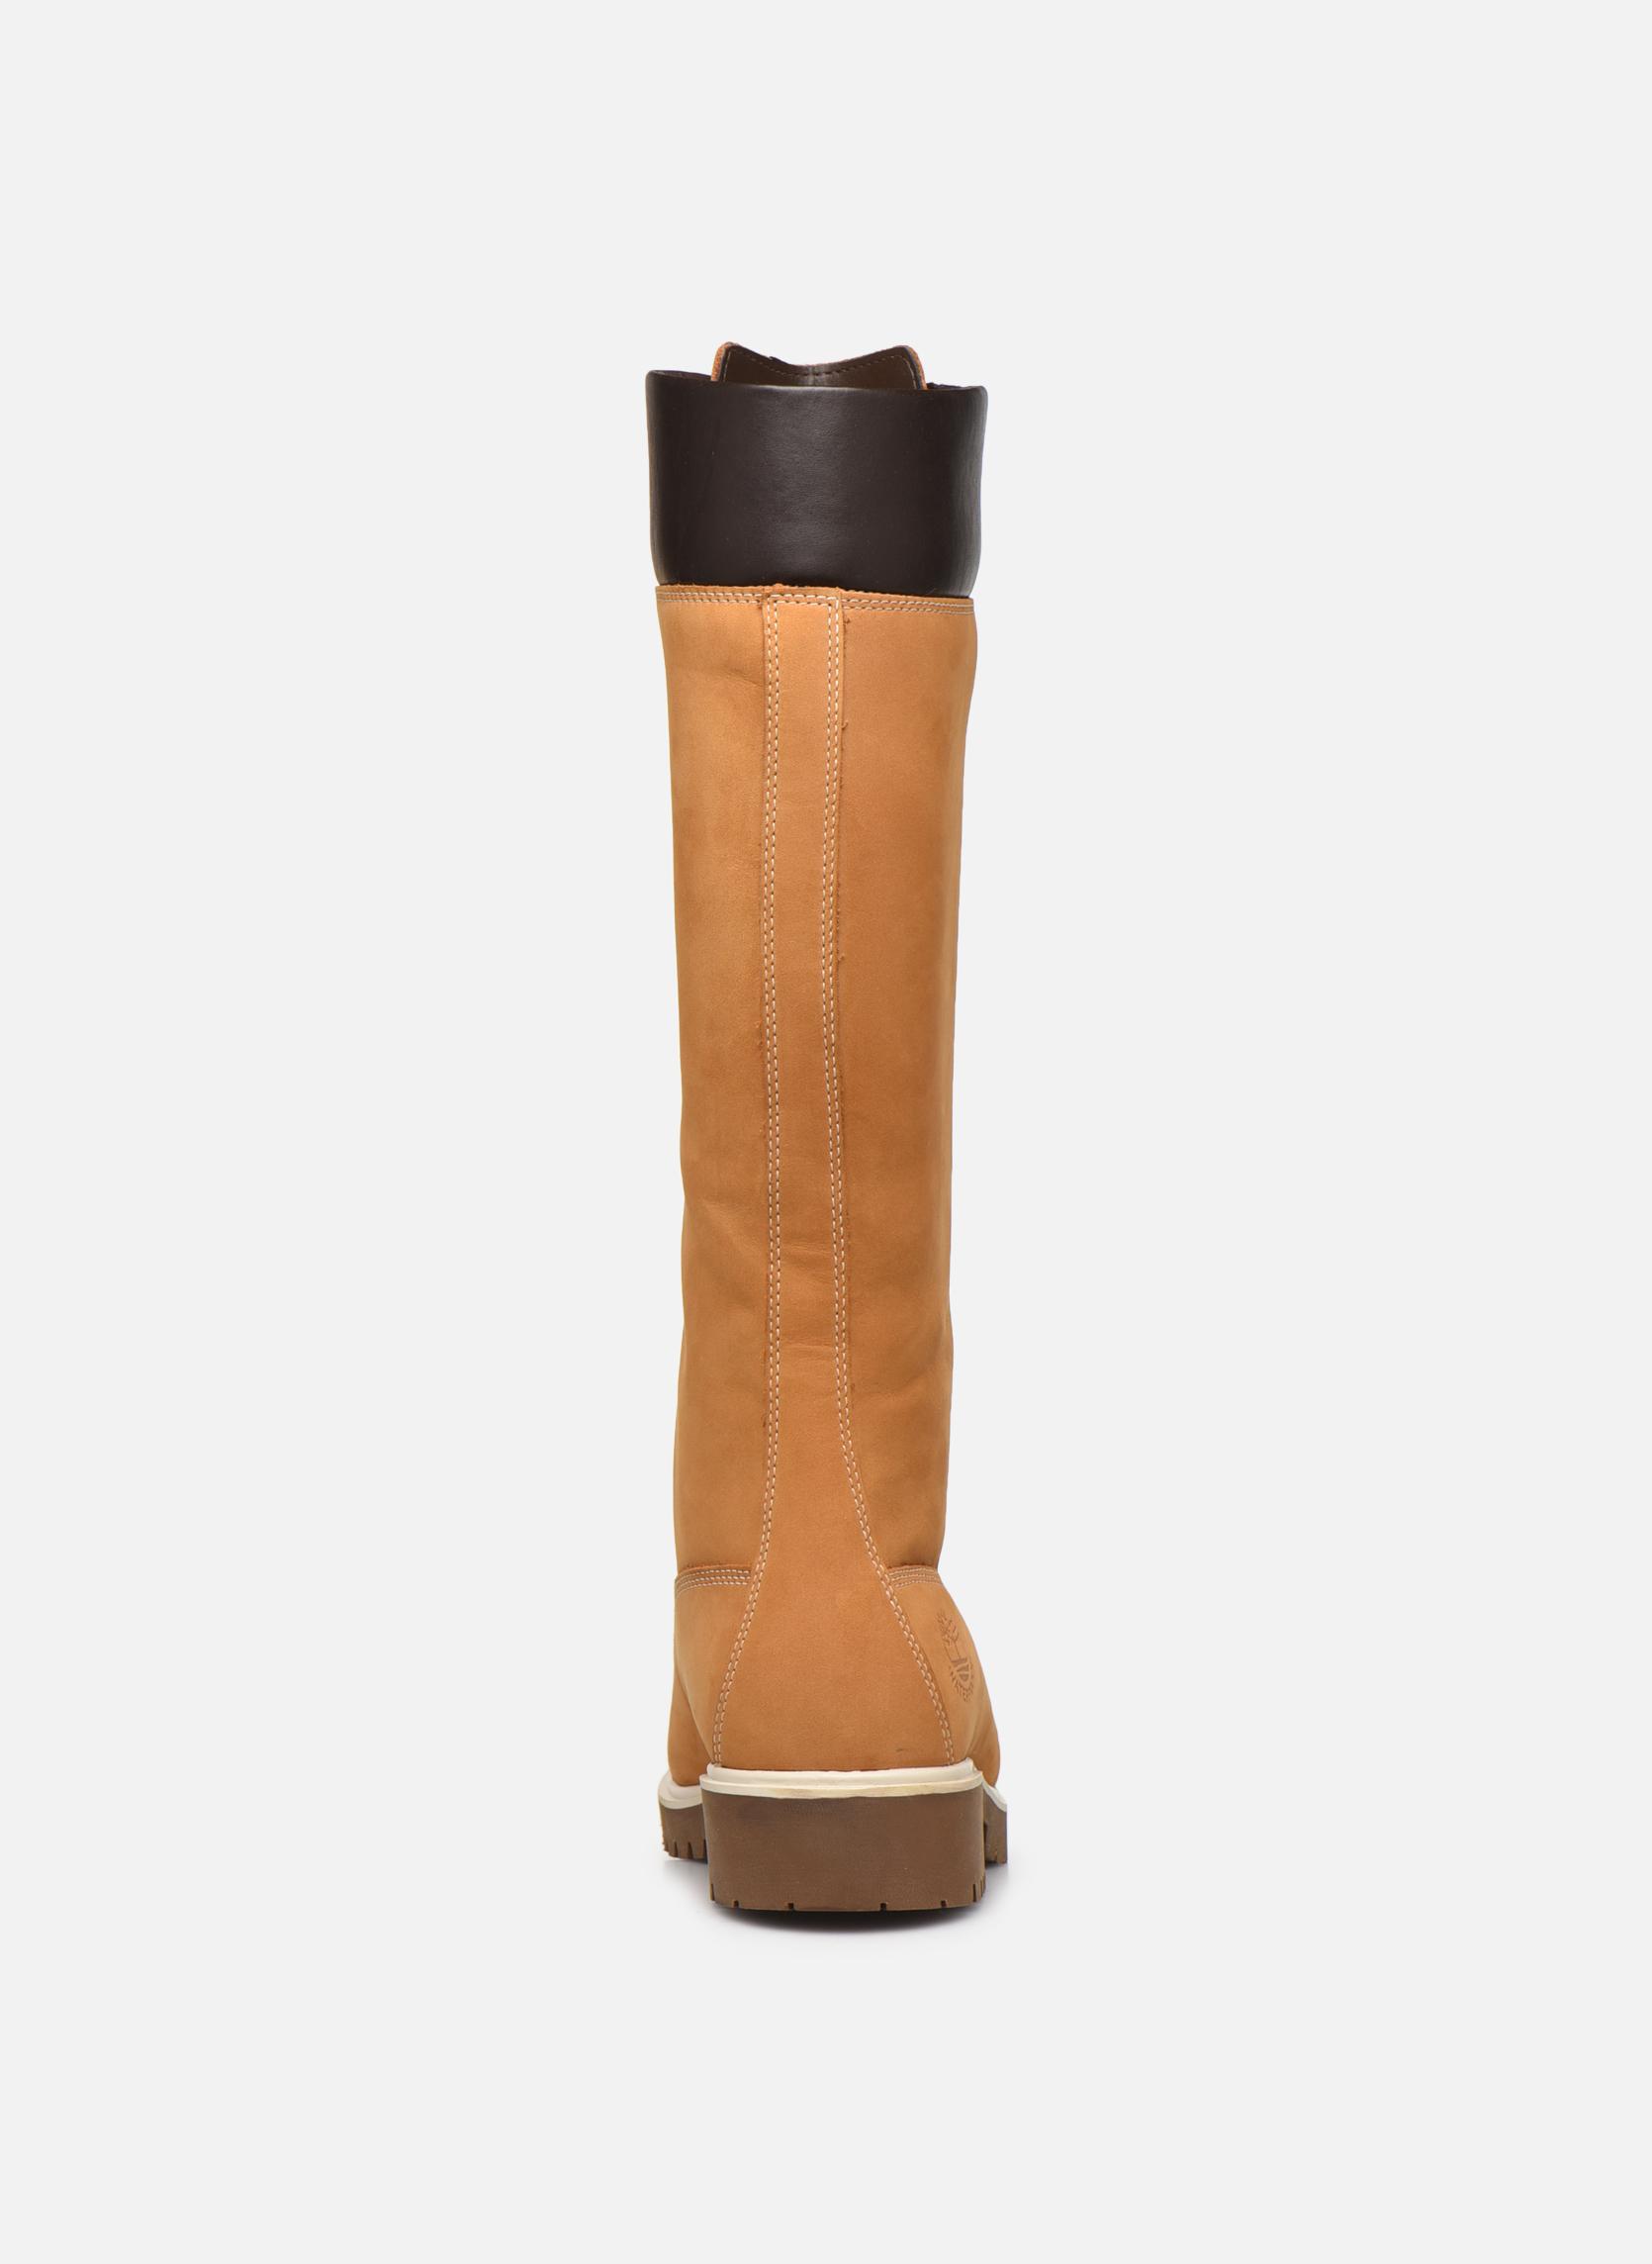 Bottes Timberland Women's Premium 14 inch Jaune vue droite